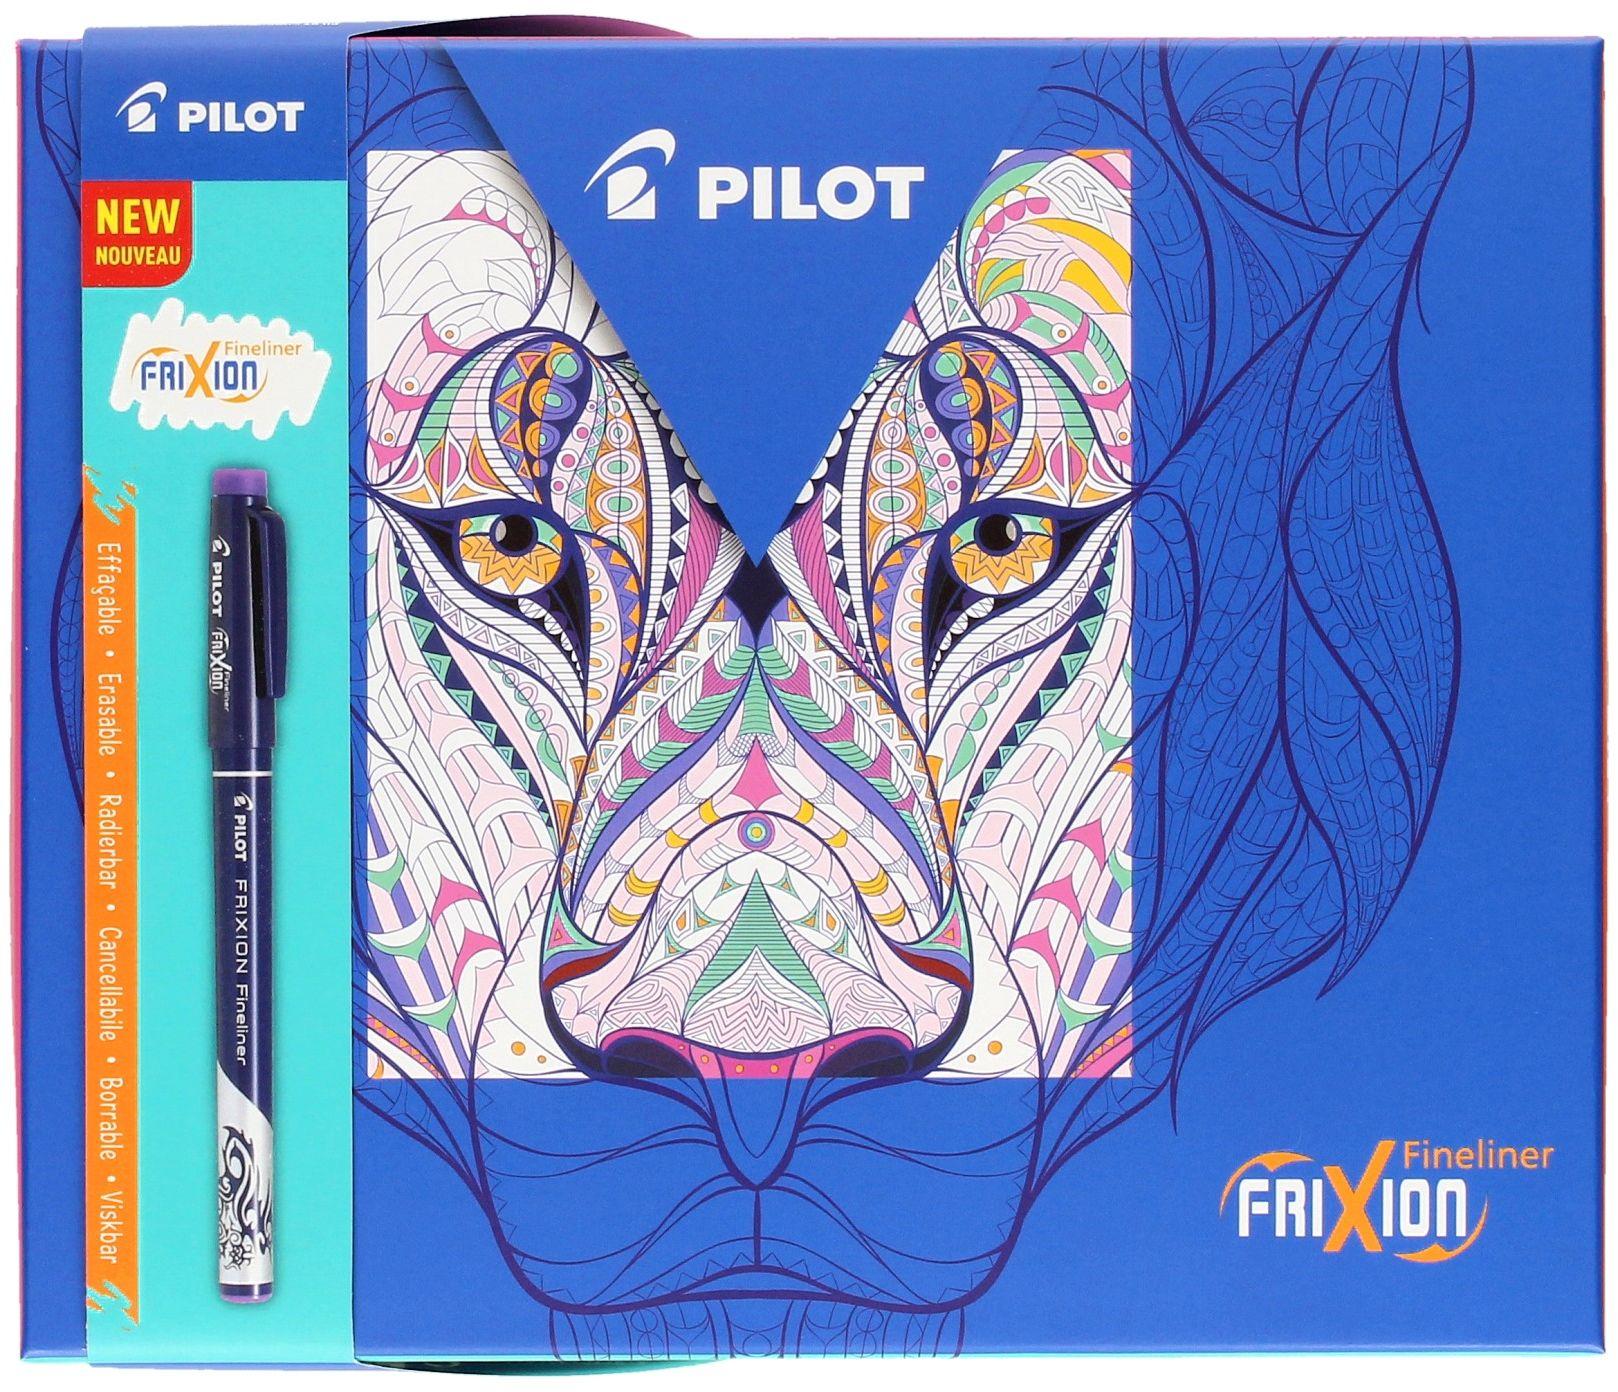 Cienkopisy 0.4mm gift box 5 kol Fineliner Frixion Pilot